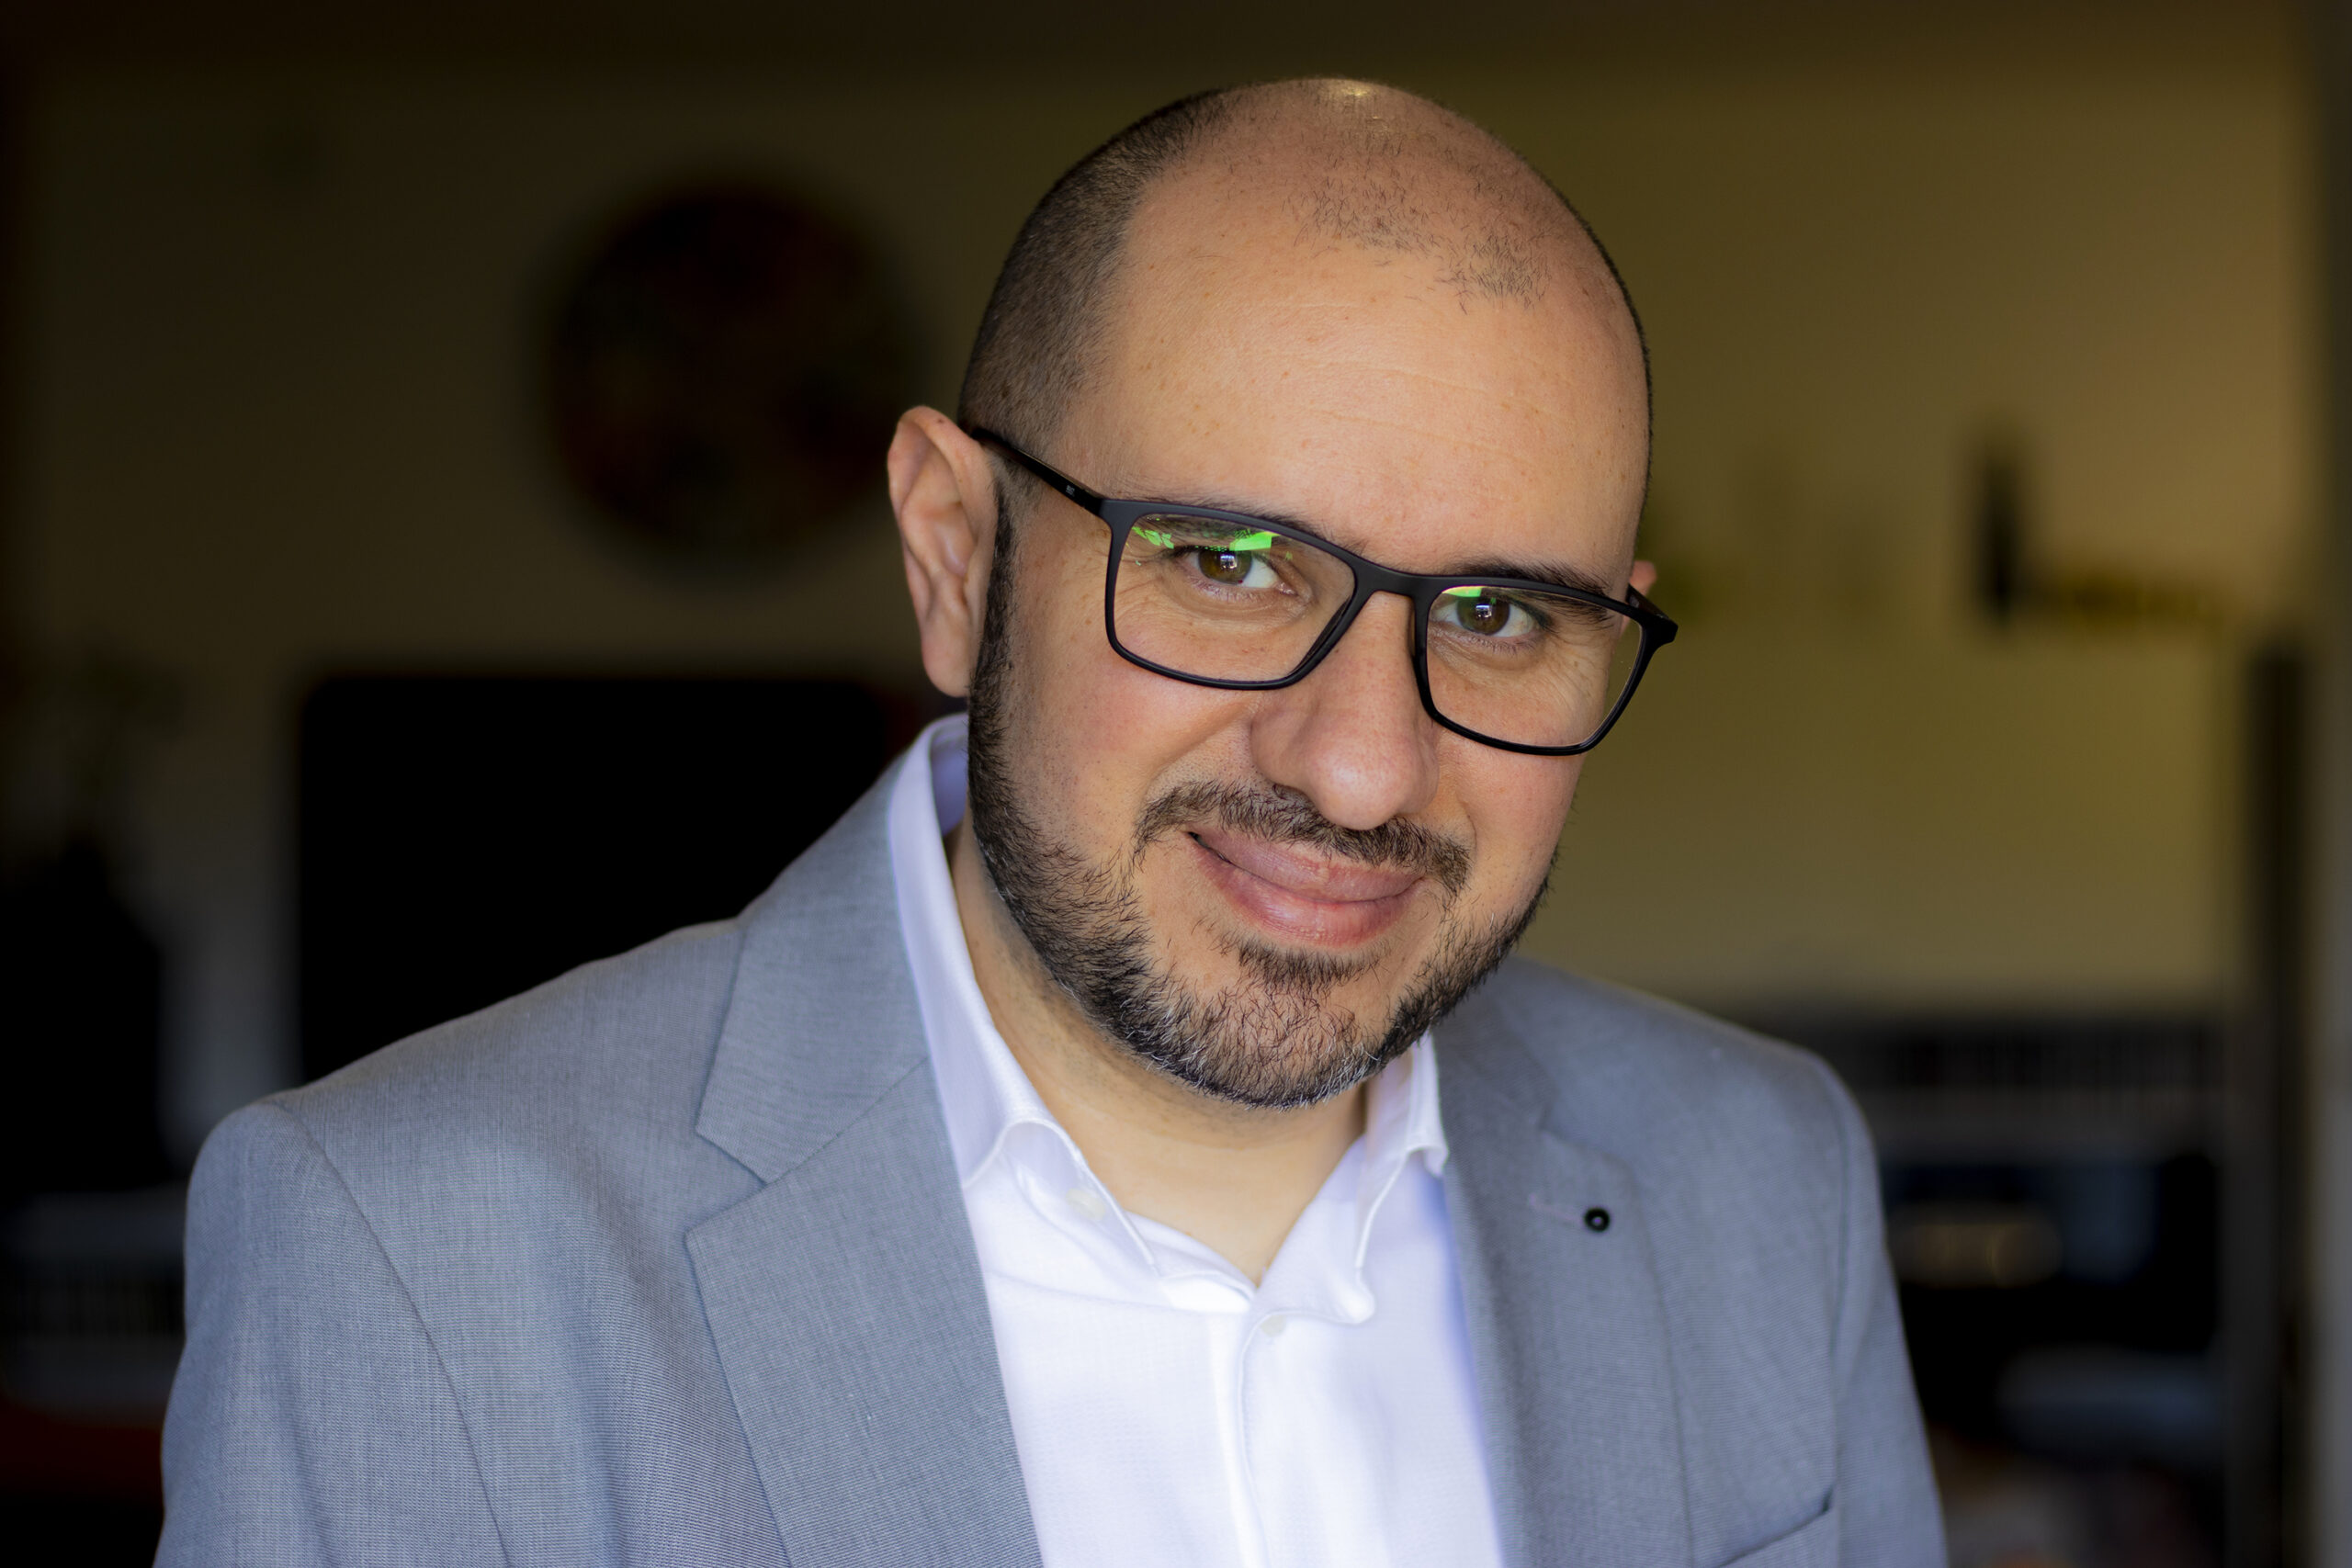 Nutrizionista Dott. Daniele Fortunato